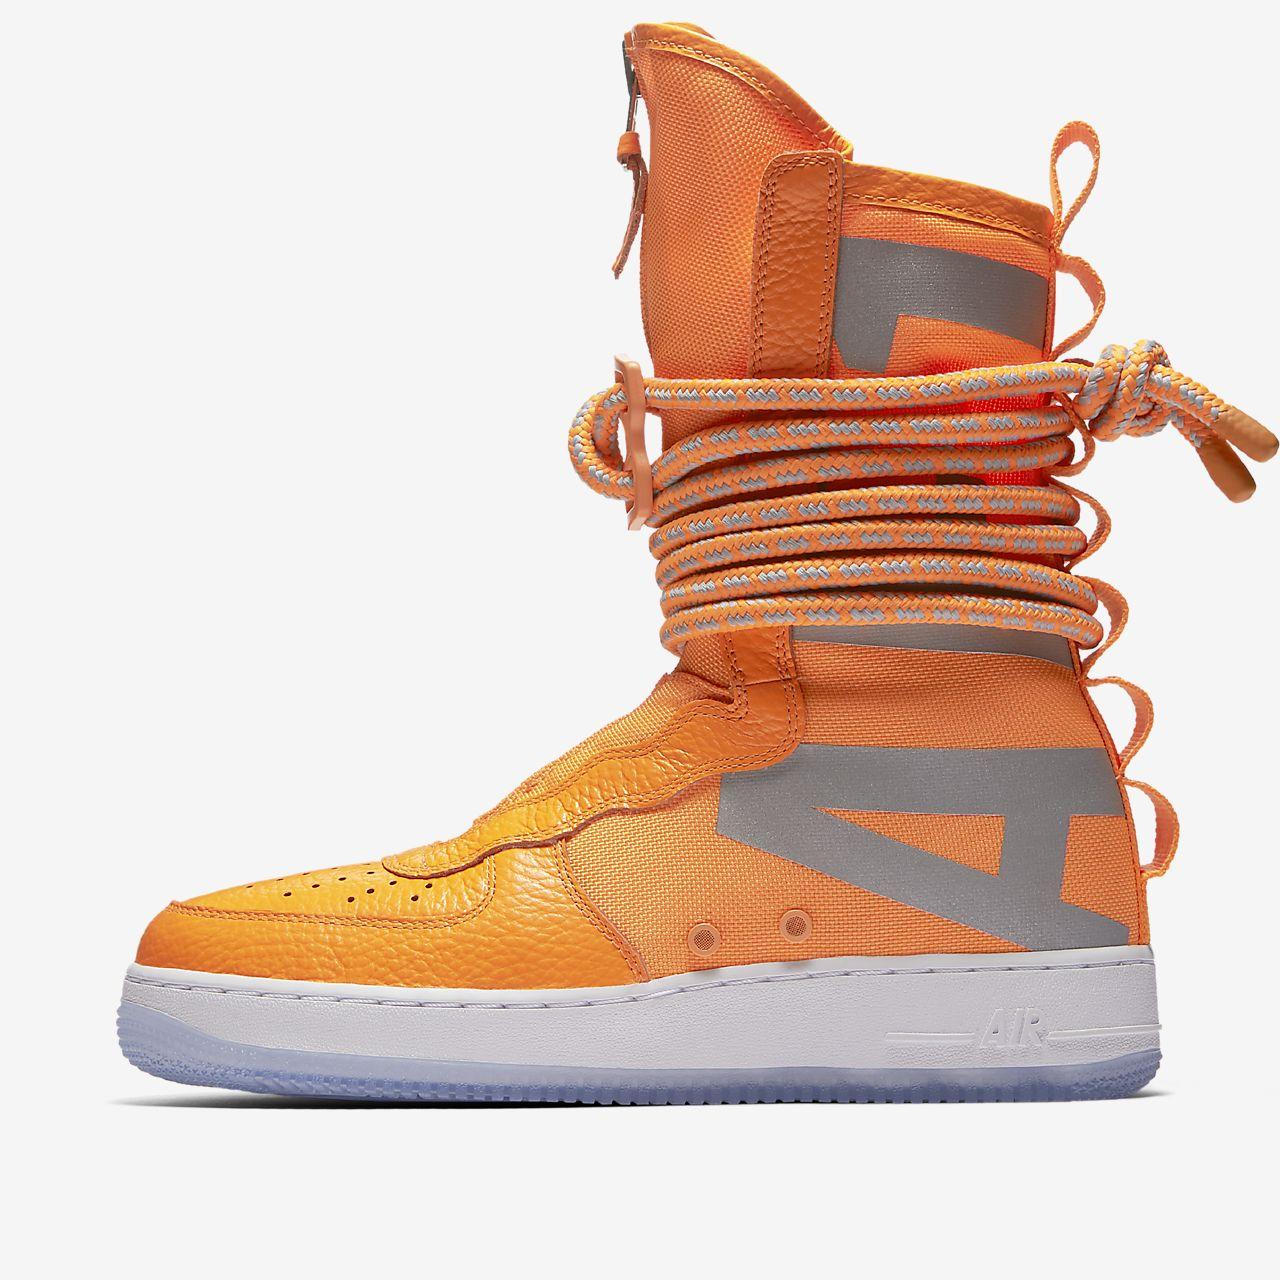 ... Nike SF Air Force 1 Hi Erkek Botu